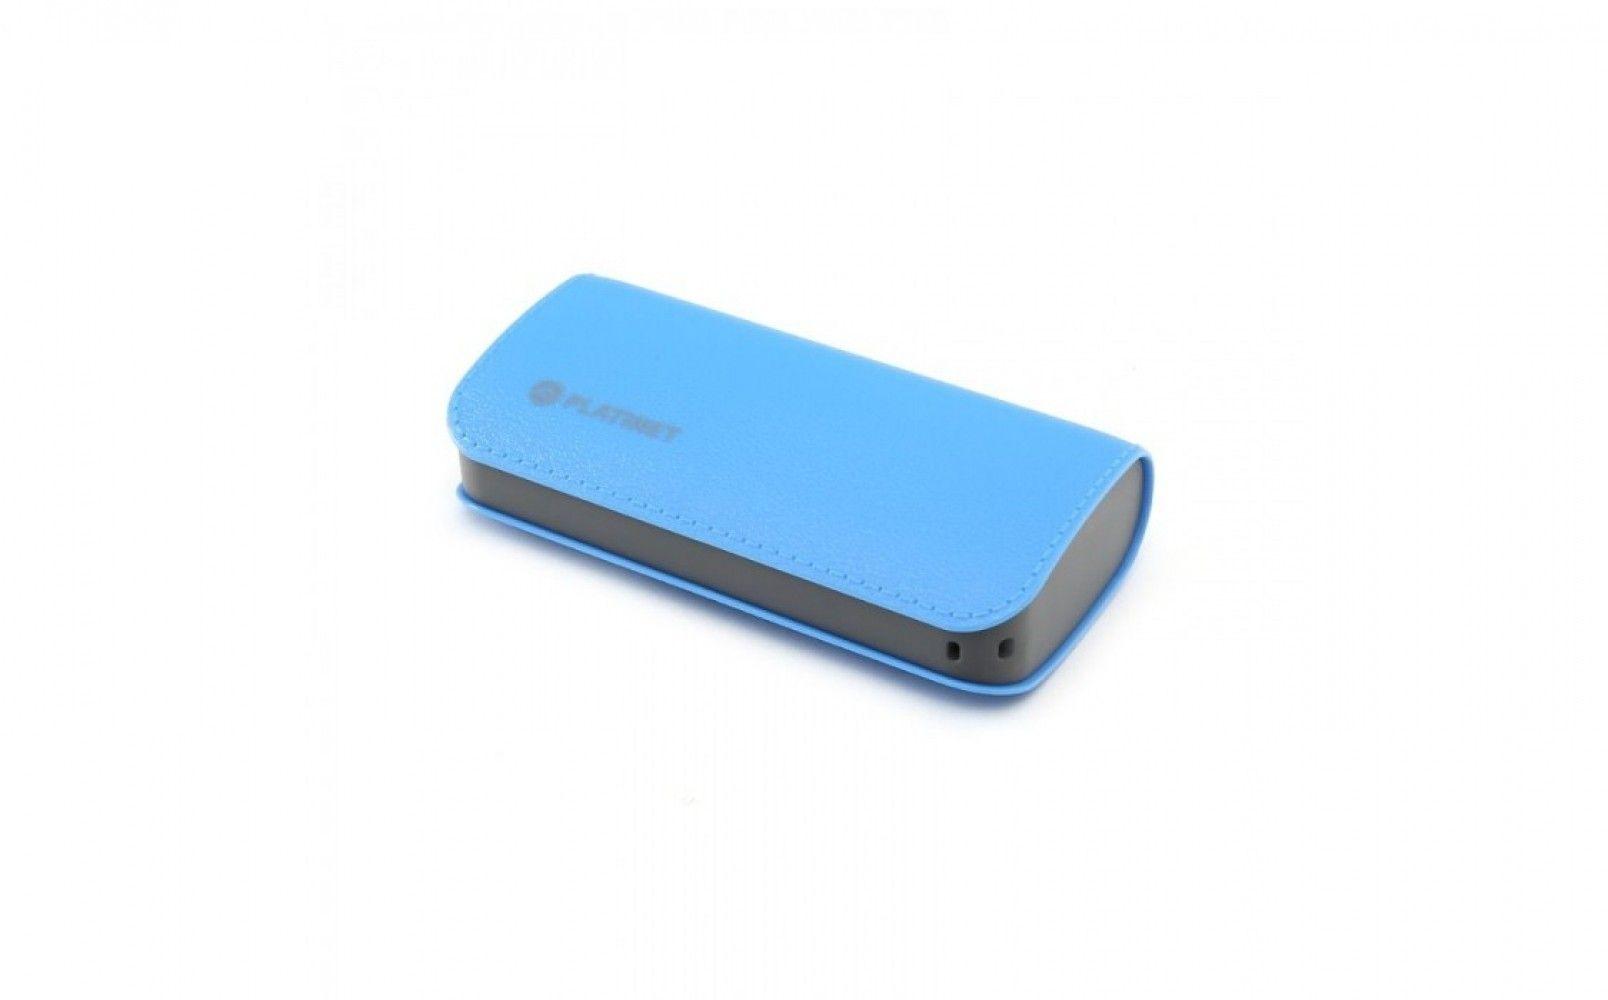 Купить Внешний аккумулятор Platinet Leather 5200mAh Blue